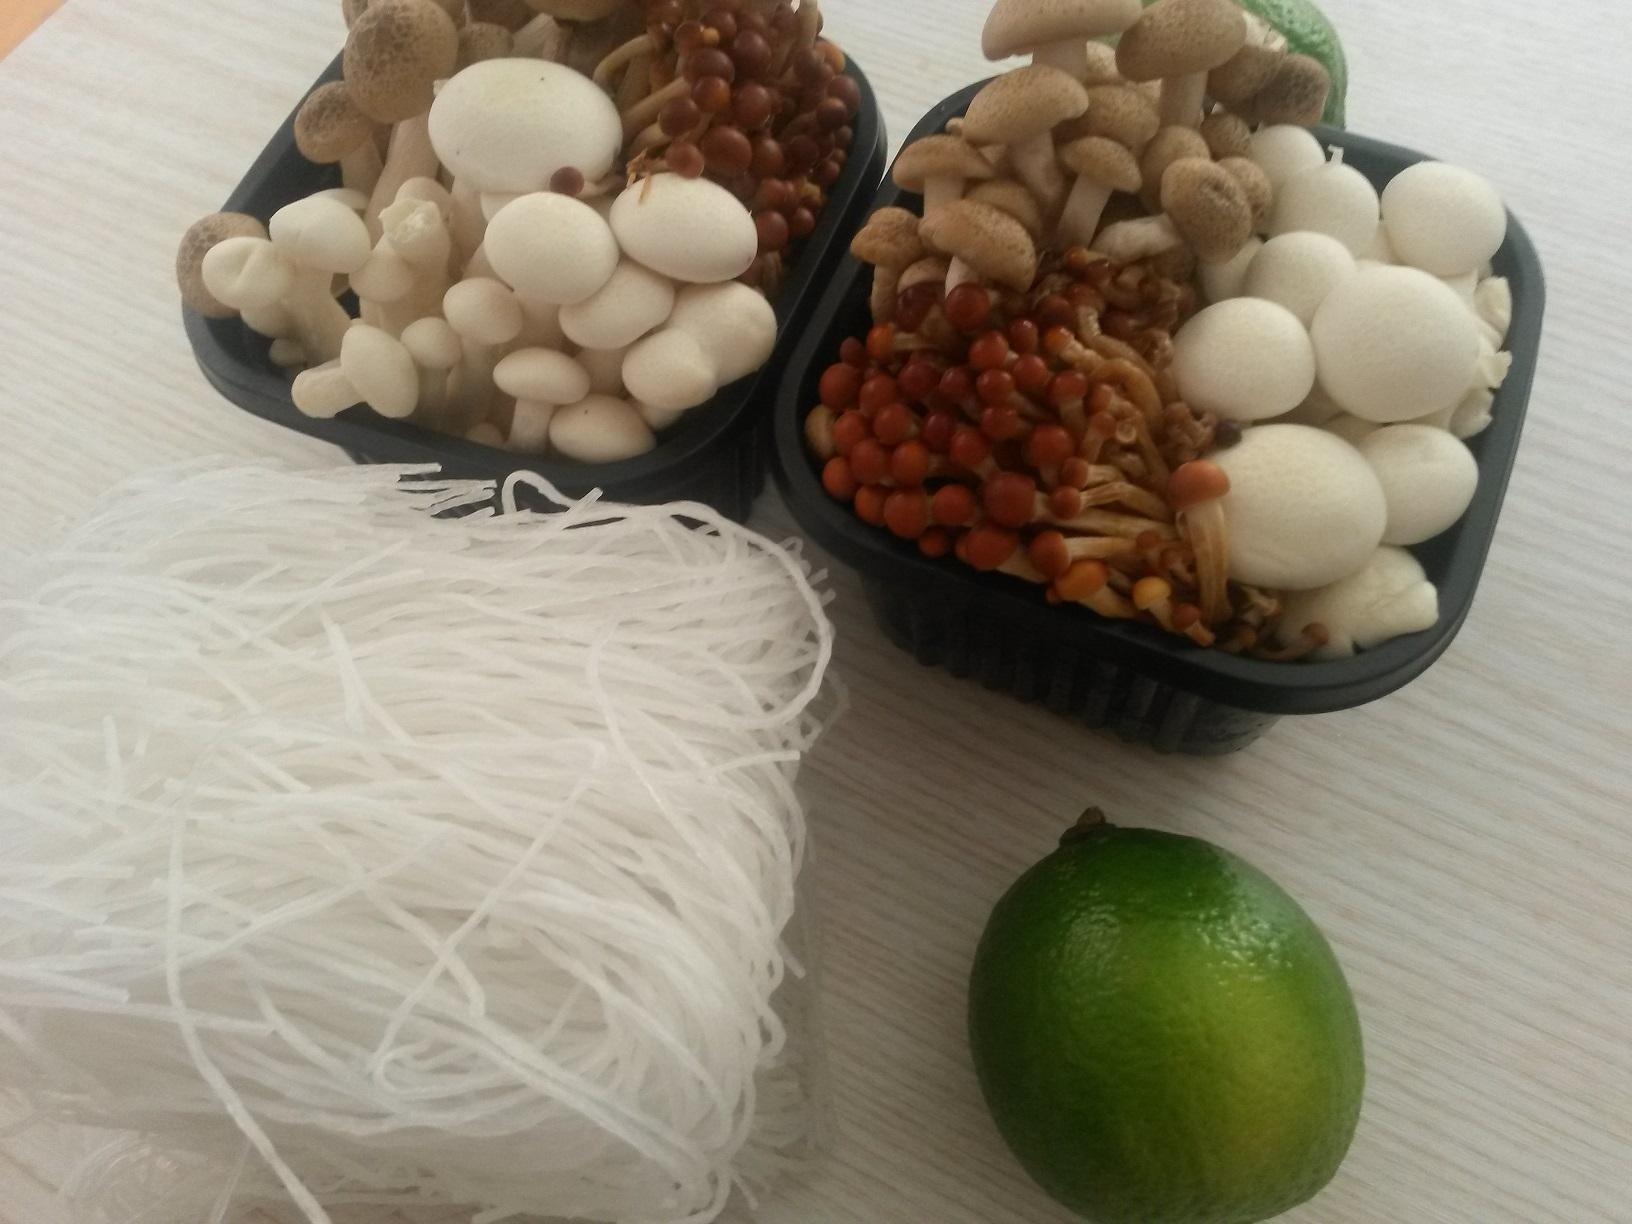 Ciuperci Shimeji sotate | Food and beyond…